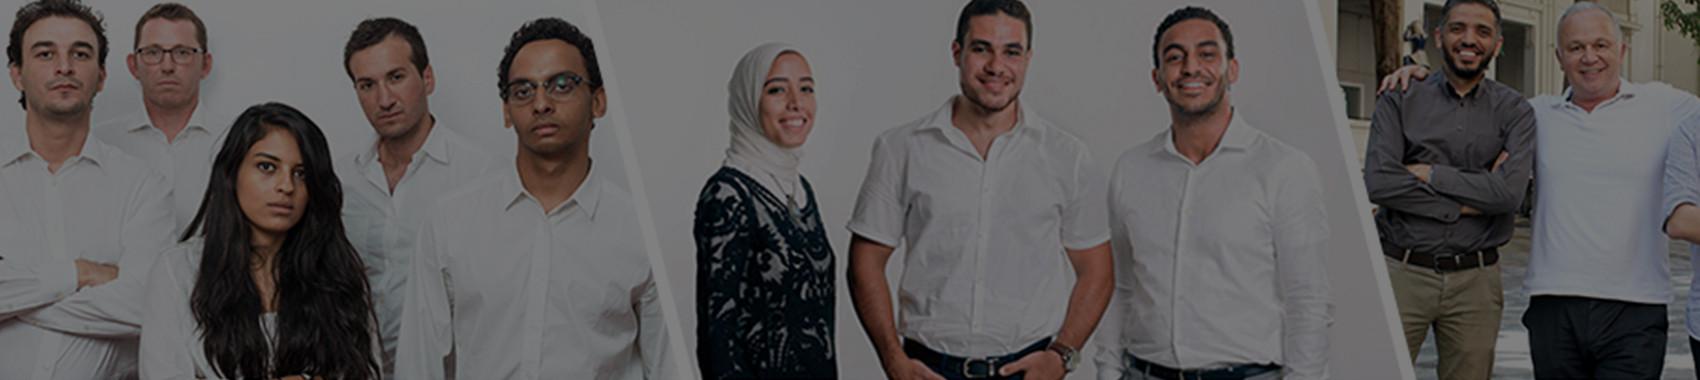 20 Most Promising Egyptian Startups